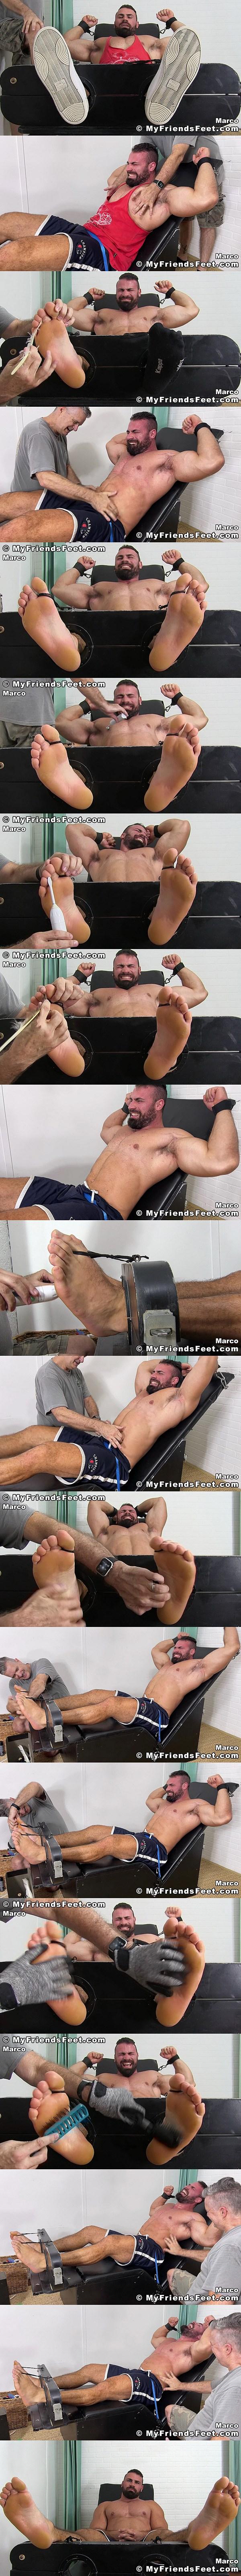 Myfriendsfeet - Marco Pinotti Tickled 02